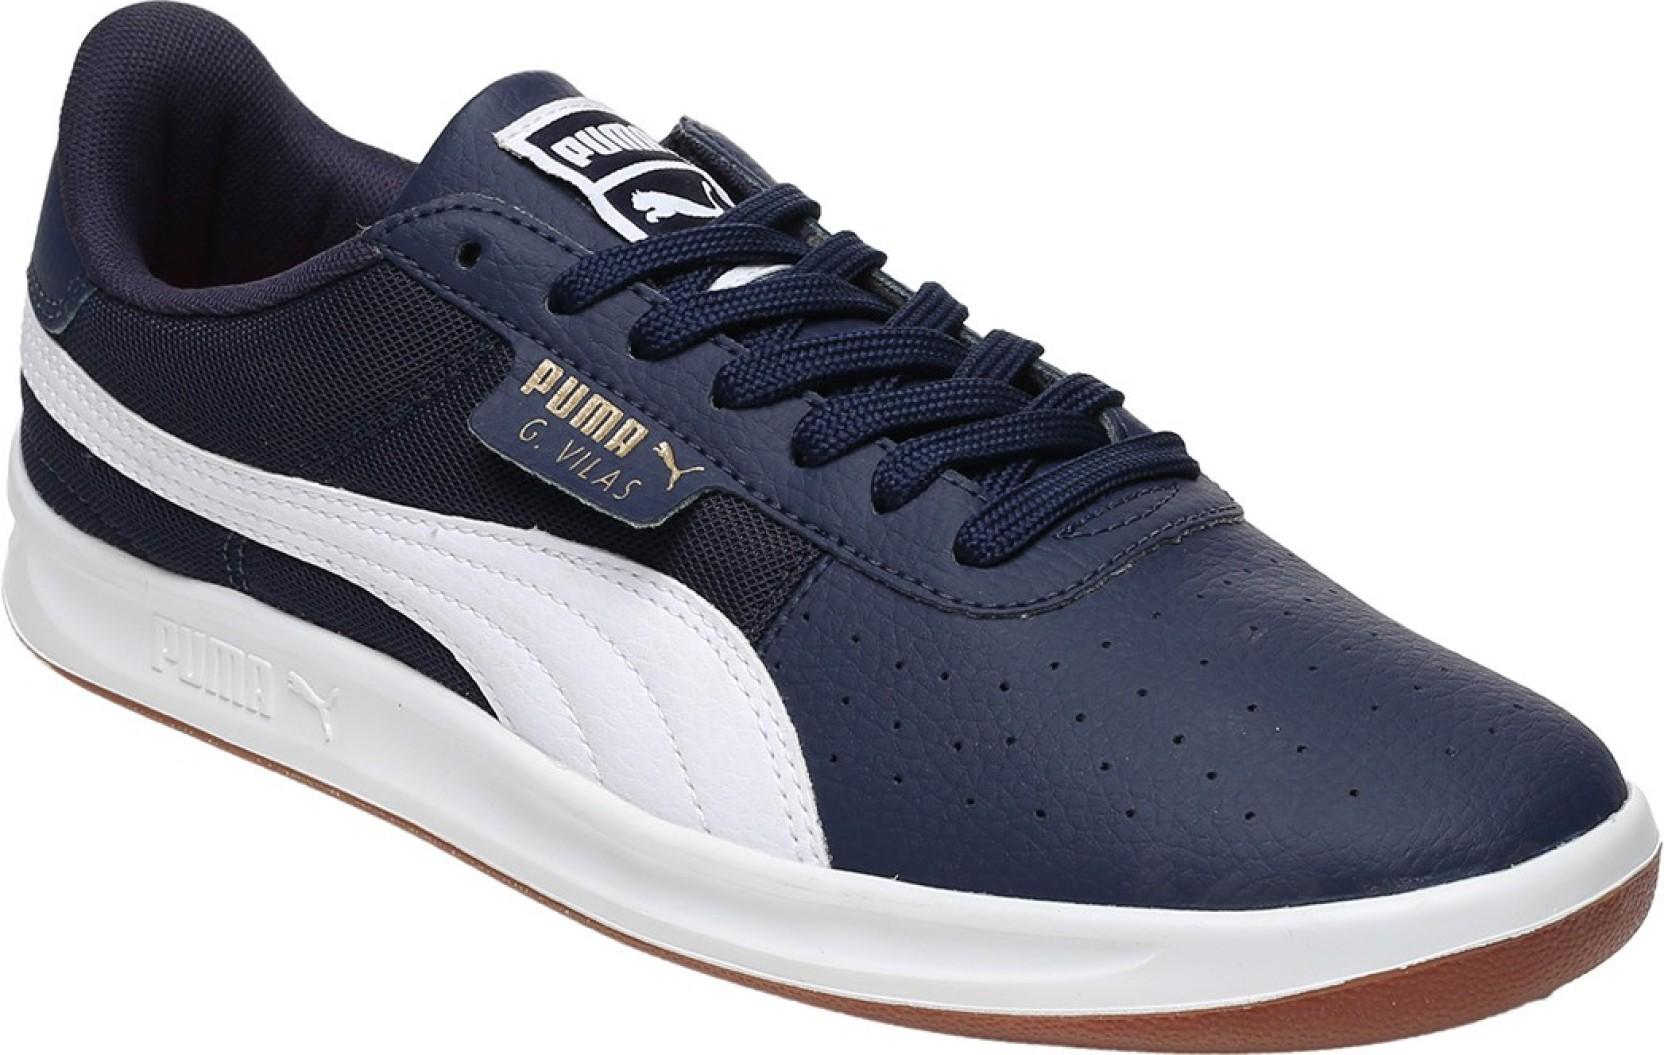 74cc74f4f6e5 Puma G. Vilas 2 Core IDP Sneakers For Men - Buy Blue Color Puma G ...